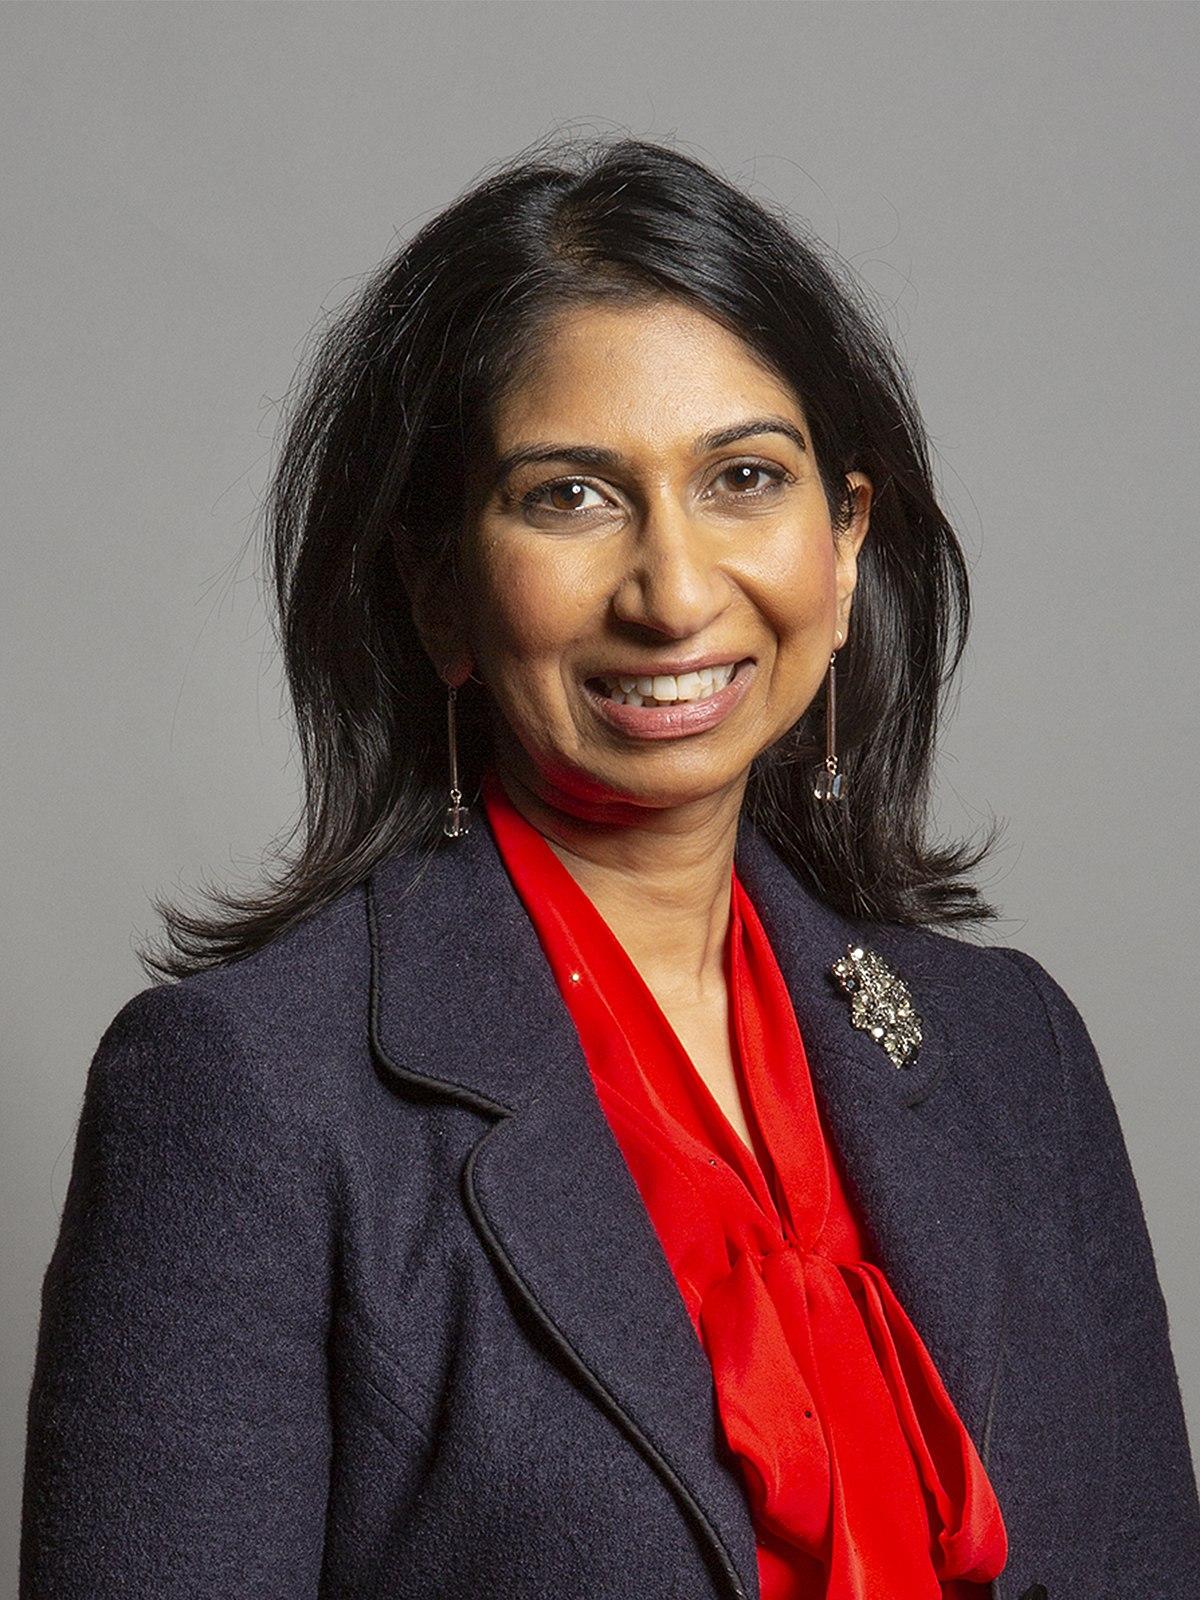 Indian-origin minister back in UK Cabinet after maternity leave